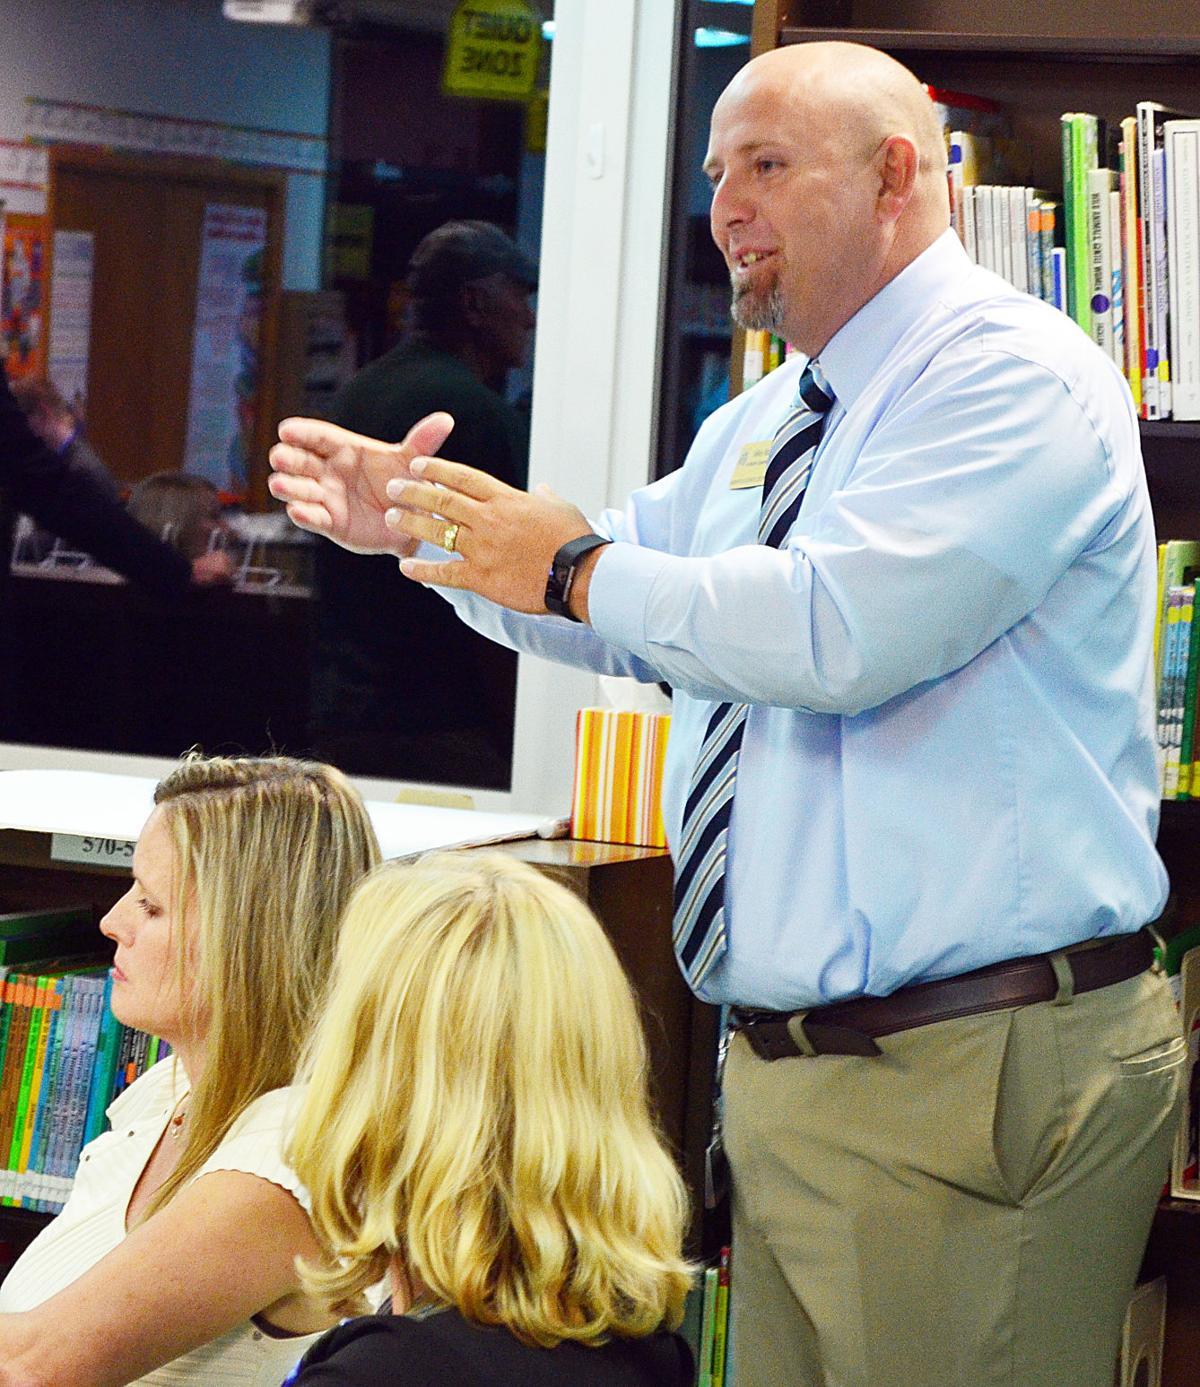 Assistant Superintendent Speaks